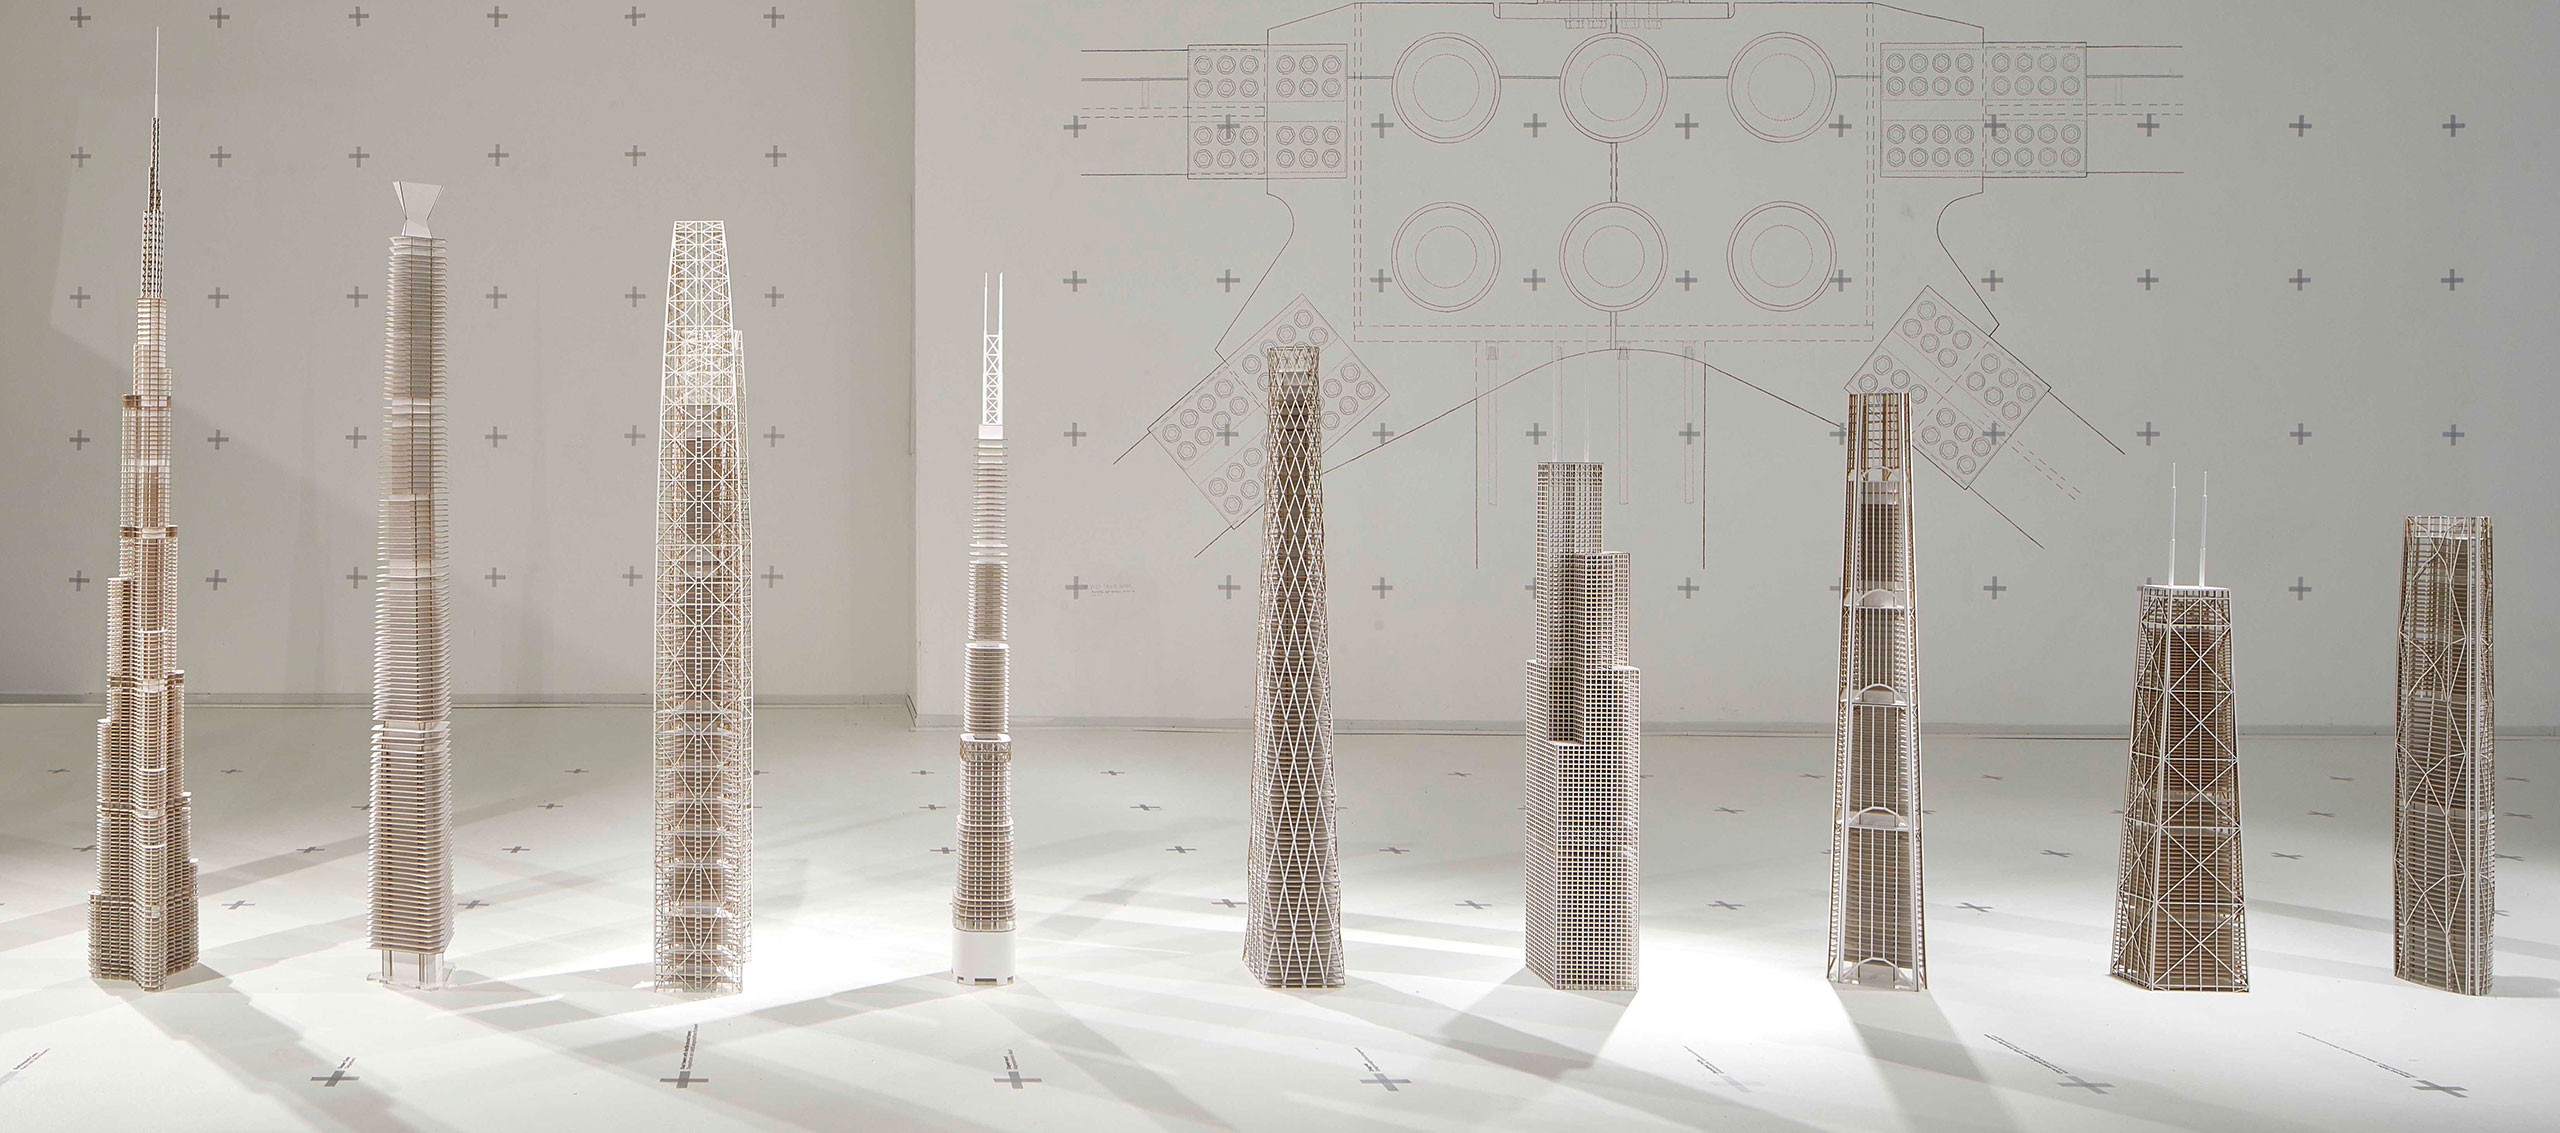 SOM: Engineering x [Art + Architecture]. Imagen cortesía de SOM